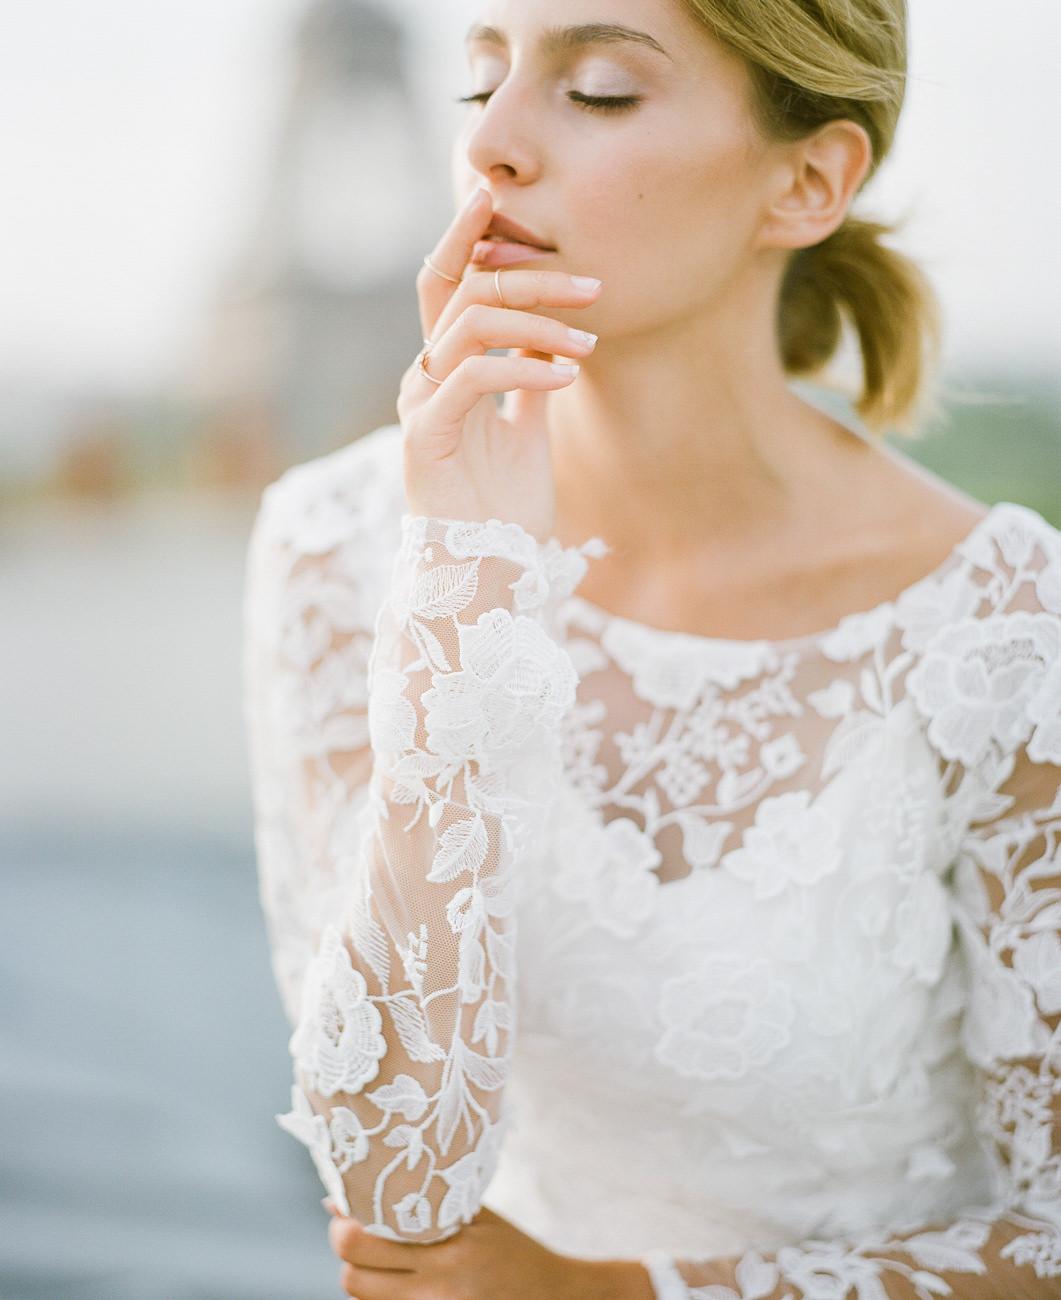 toits-paris-photographe-mariage-alain-m-5.jpg